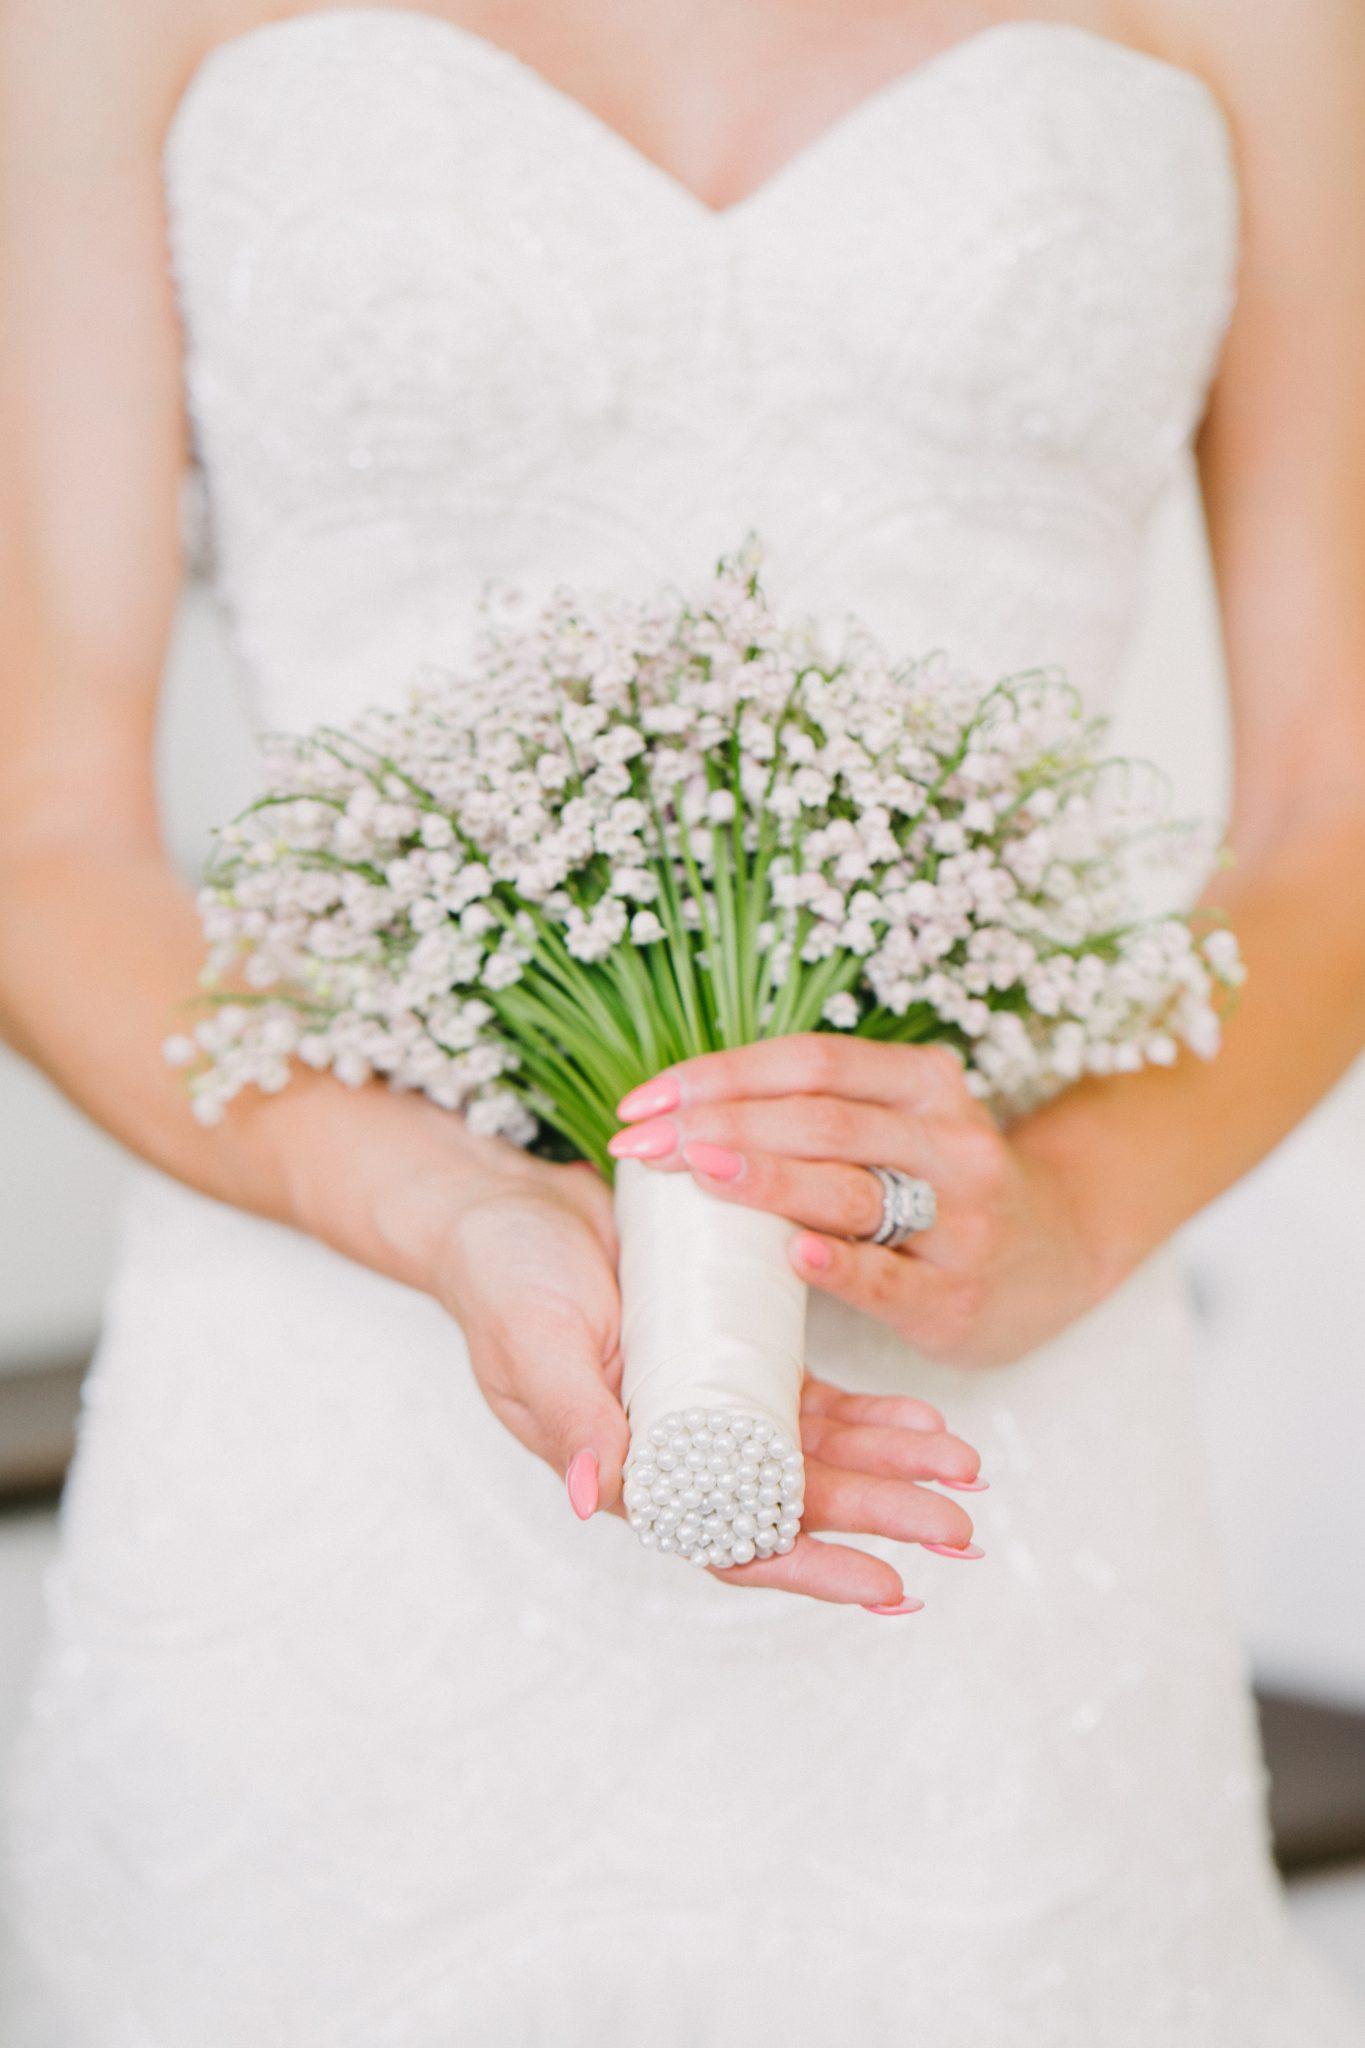 Lilly_of_the_Valley_Bridal_Bouquet, Dayton_Ohio_wedding_flowers, Royal_Wedding_bridal_bouquet